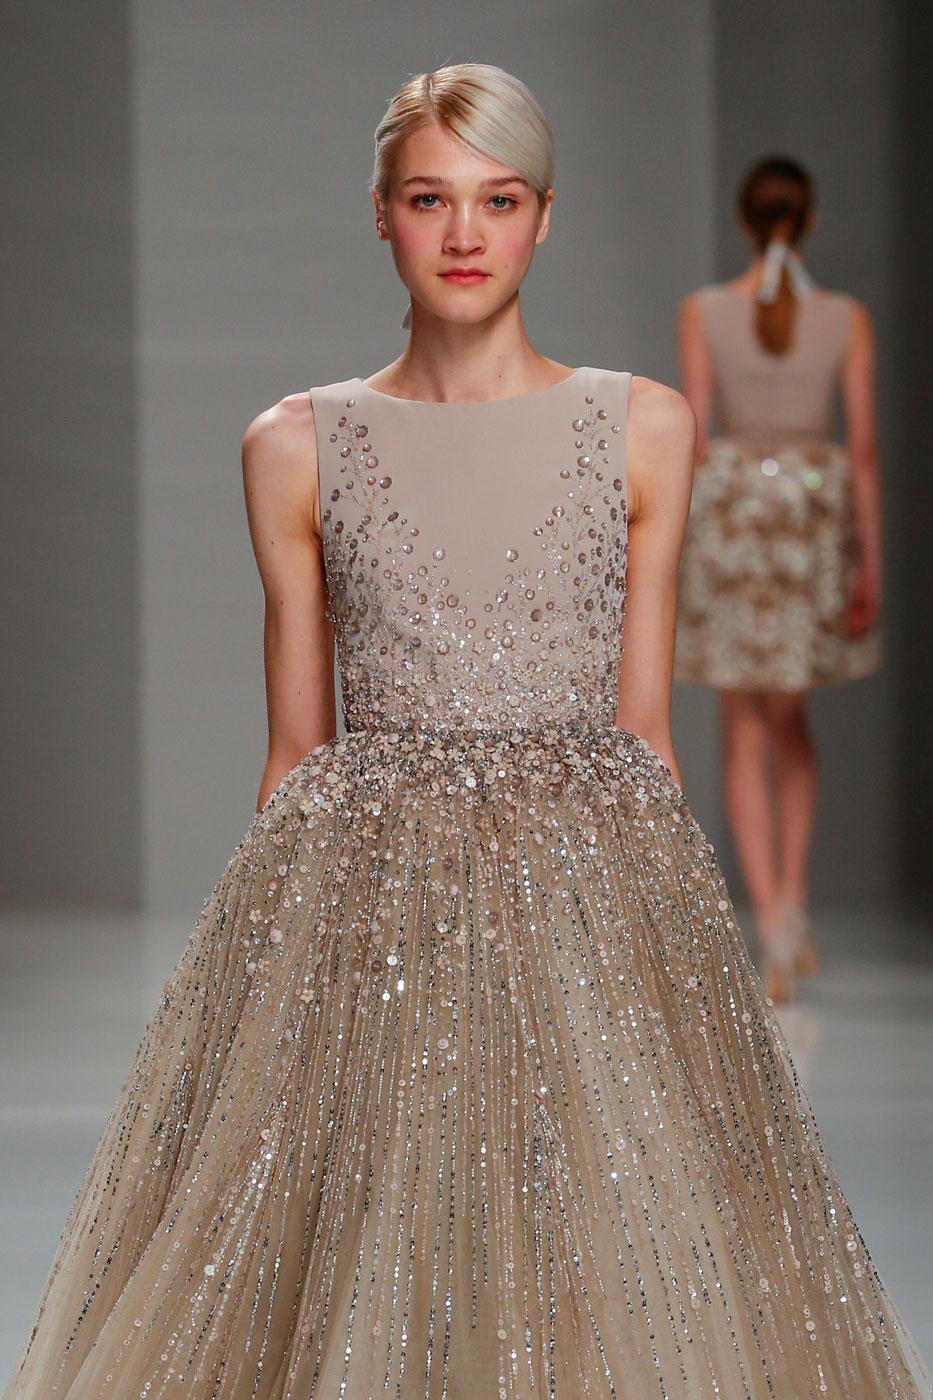 Georges-Hobeika-fashion-runway-show-haute-couture-paris-spring-2015-the-impression-56